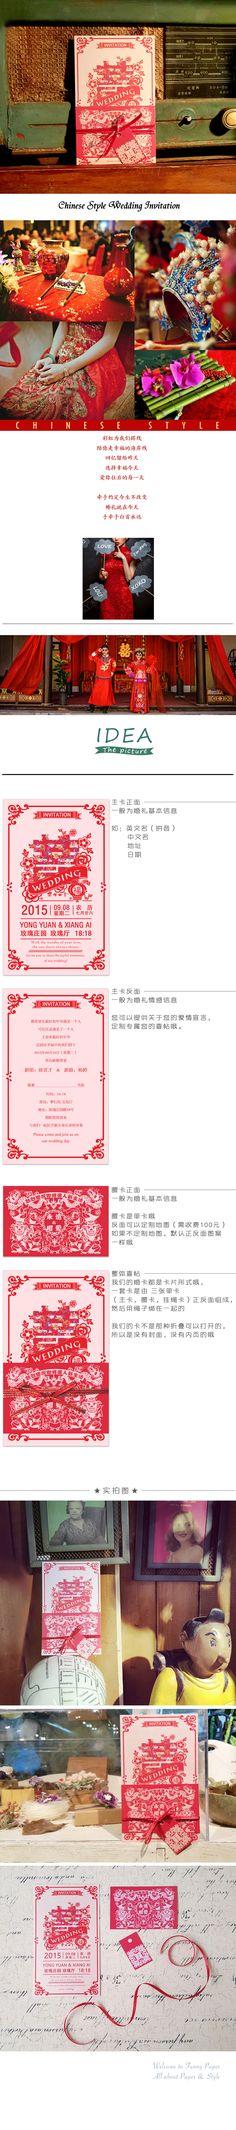 chinese wedding invitation card in malaysia%0A garden wedding invitation designs